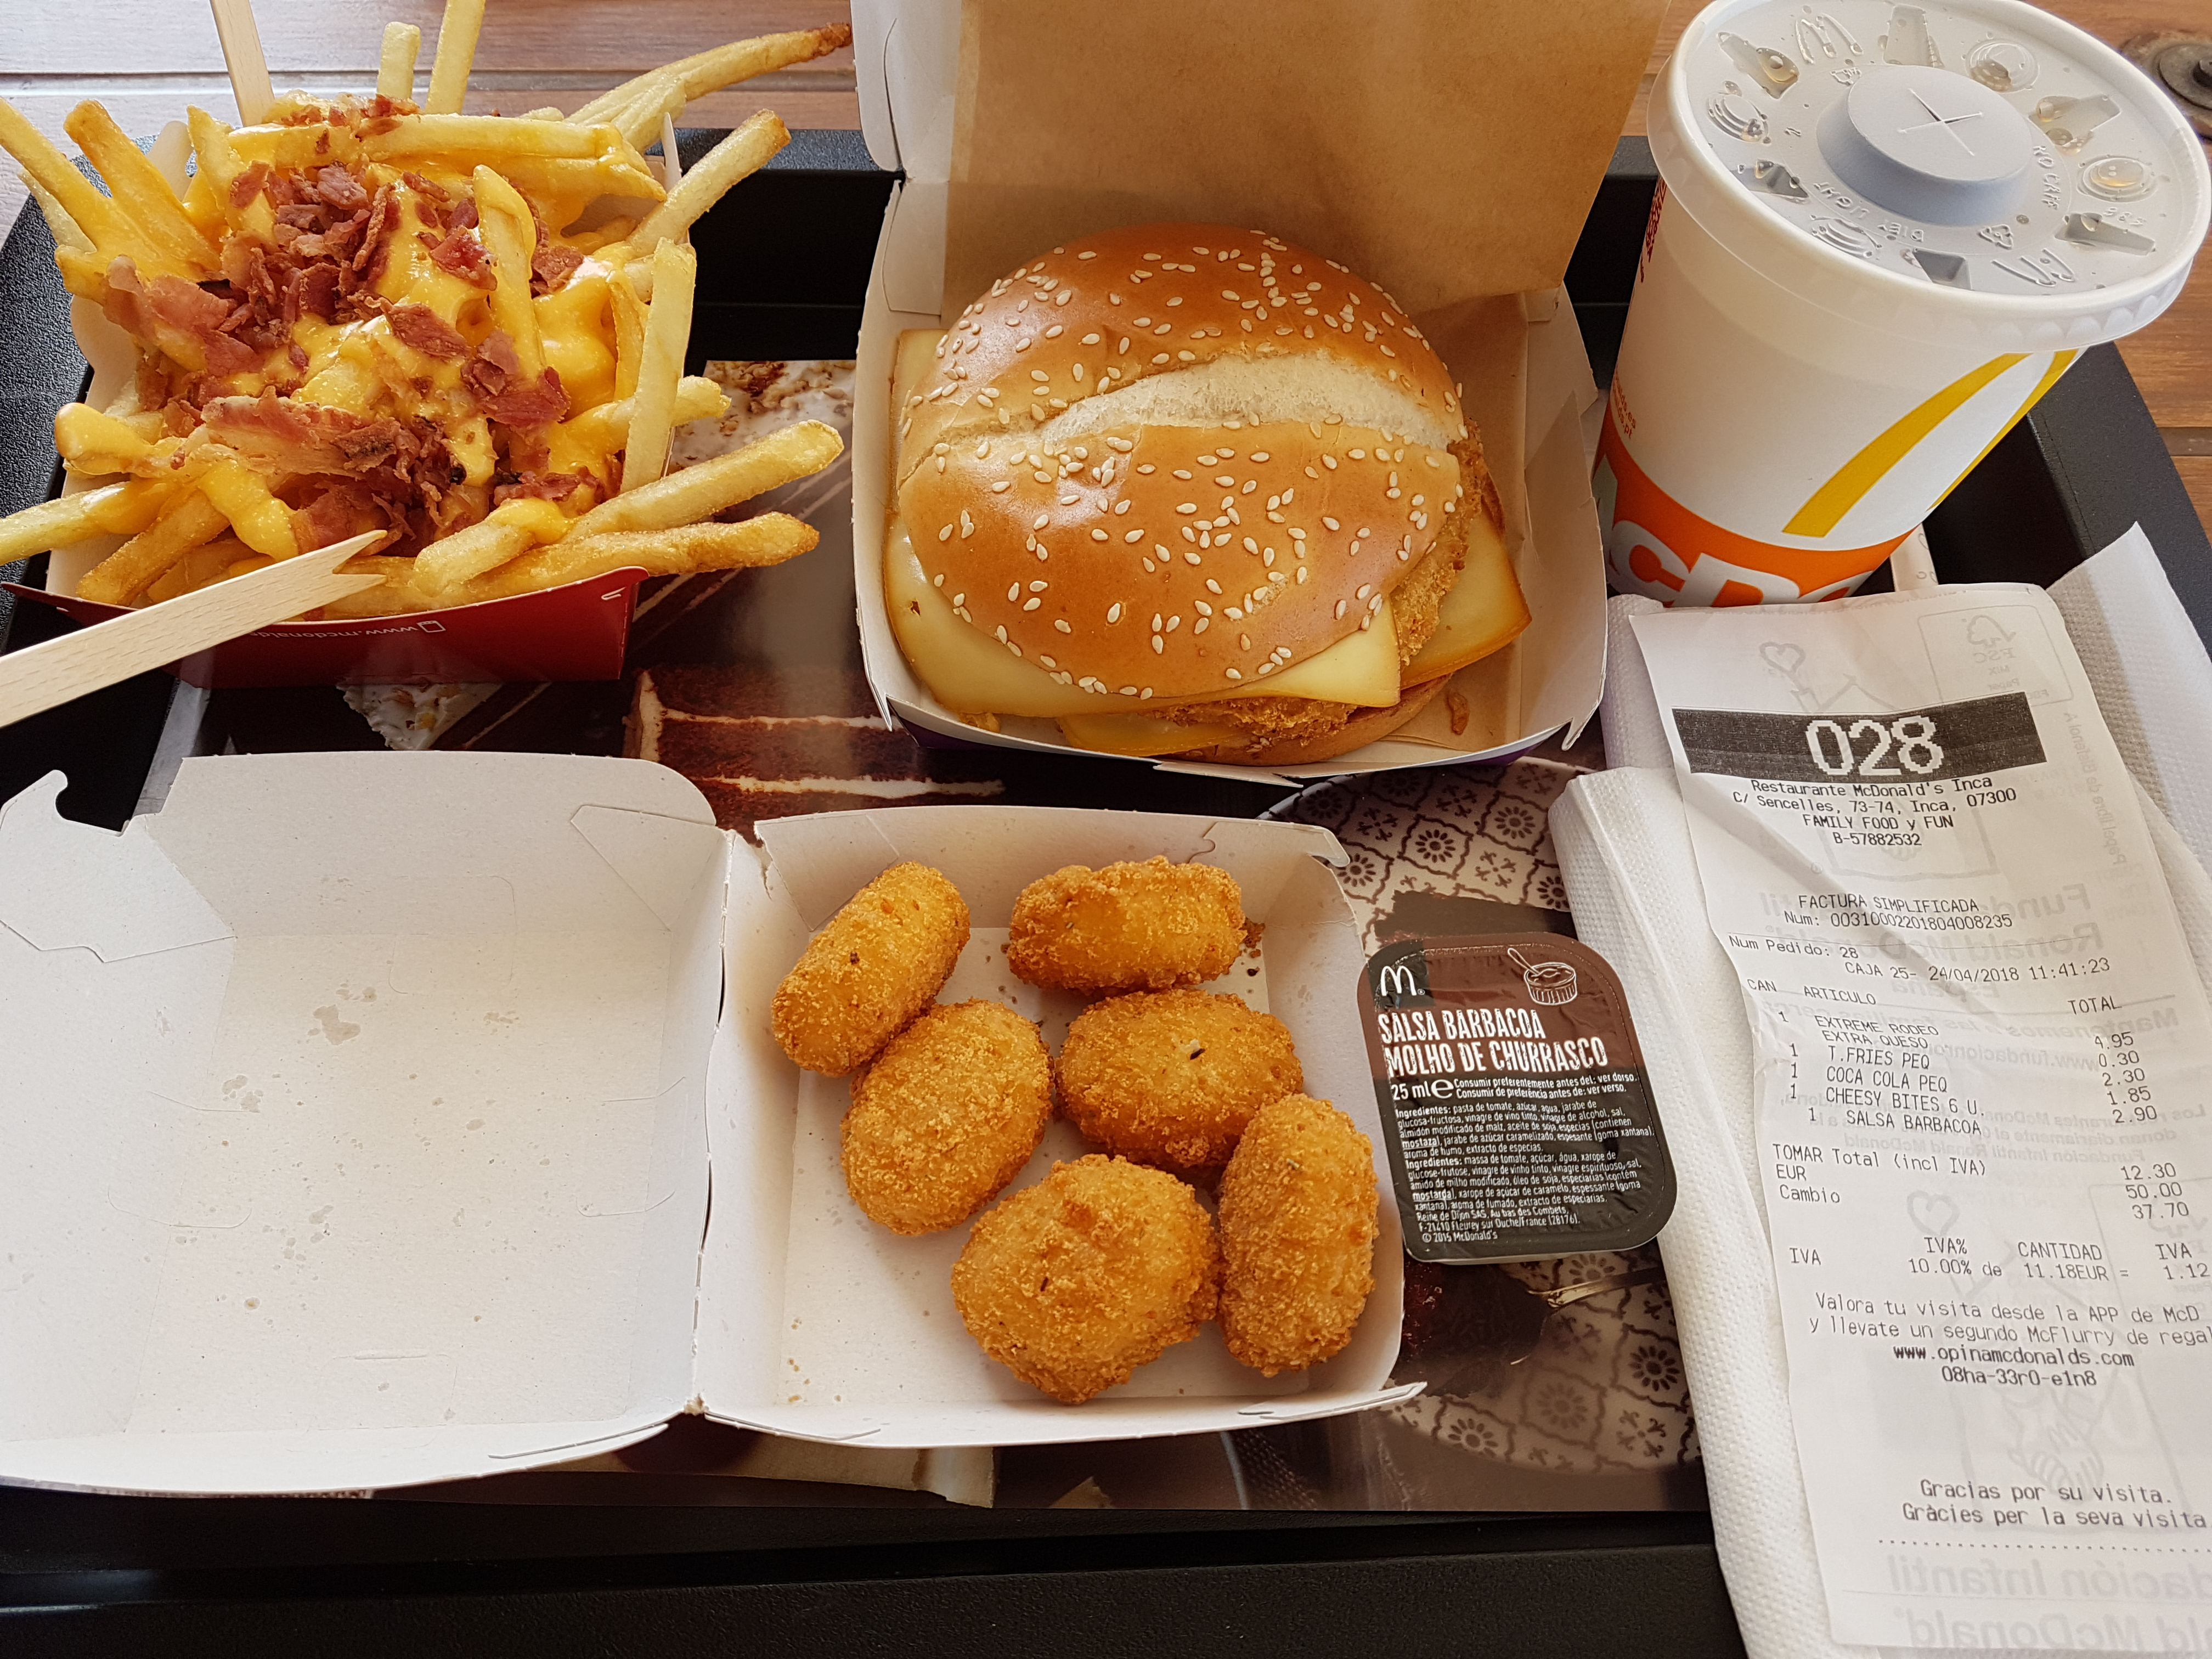 http://foodloader.net/Holz_2018-04-24_McDonalds.jpg